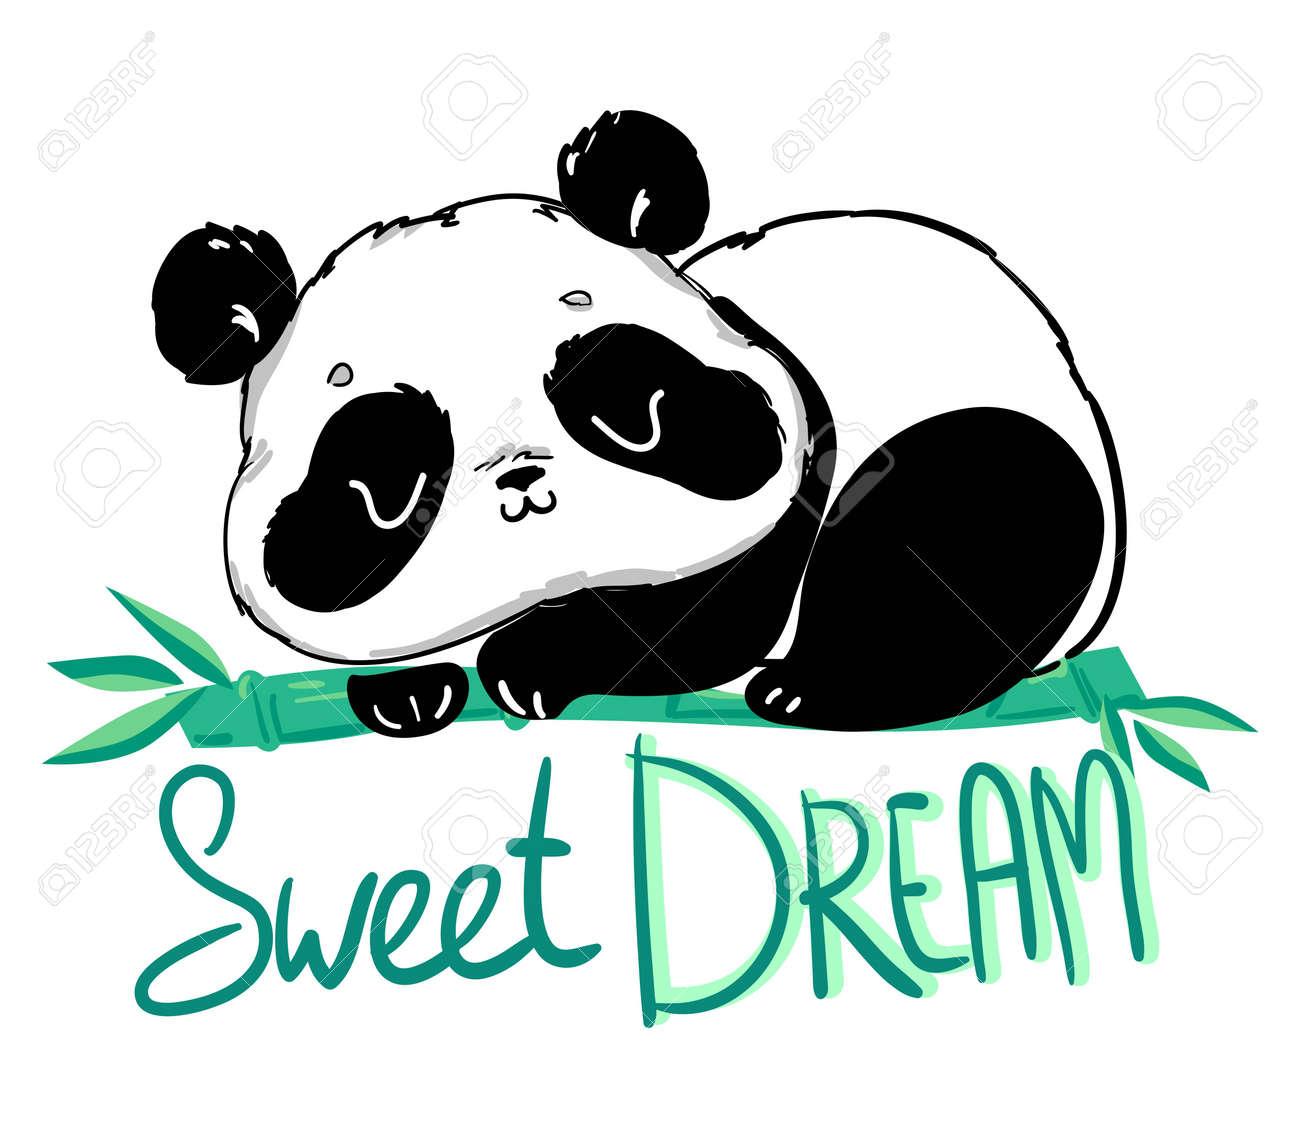 Cute Panda sitting on the bamboo. Handwritten - Sweet dream. illustration. - 143071861